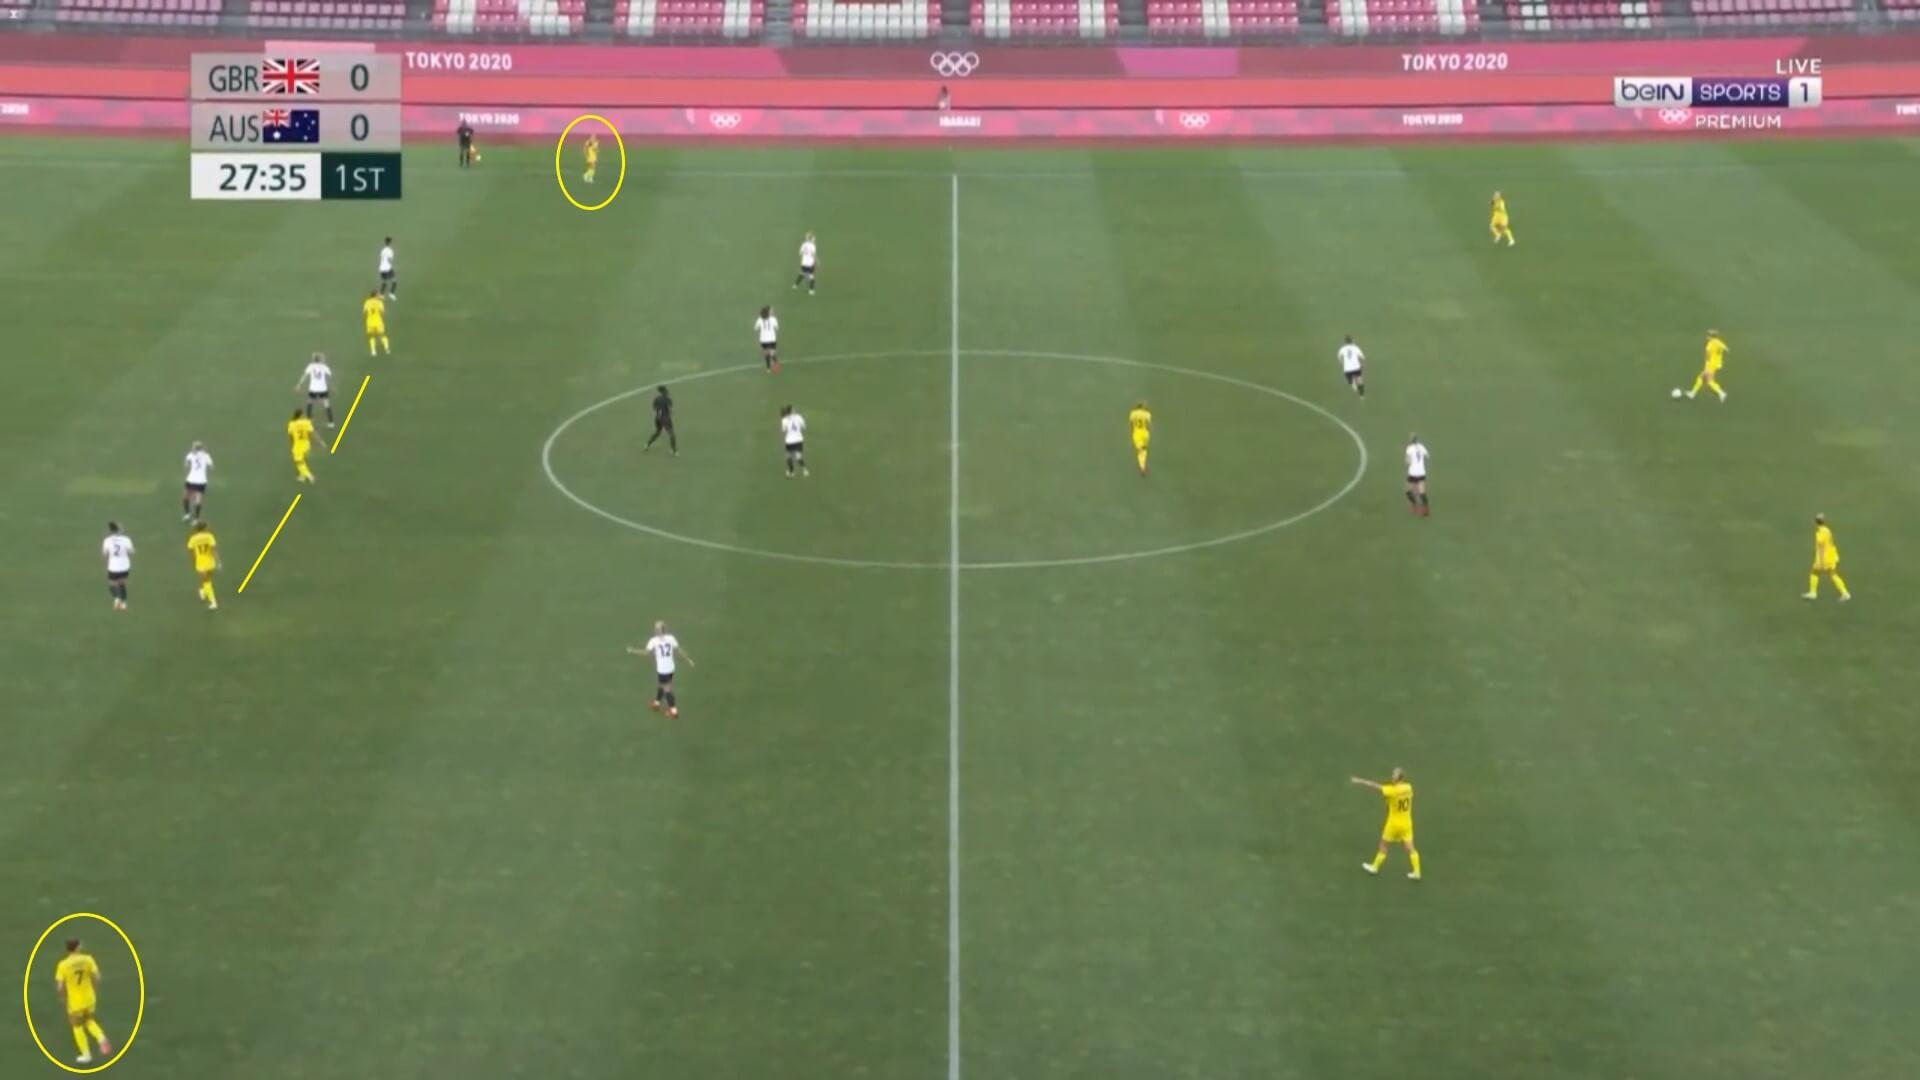 Olympics 2020: Team GB v Australia - tactical analysis tactics